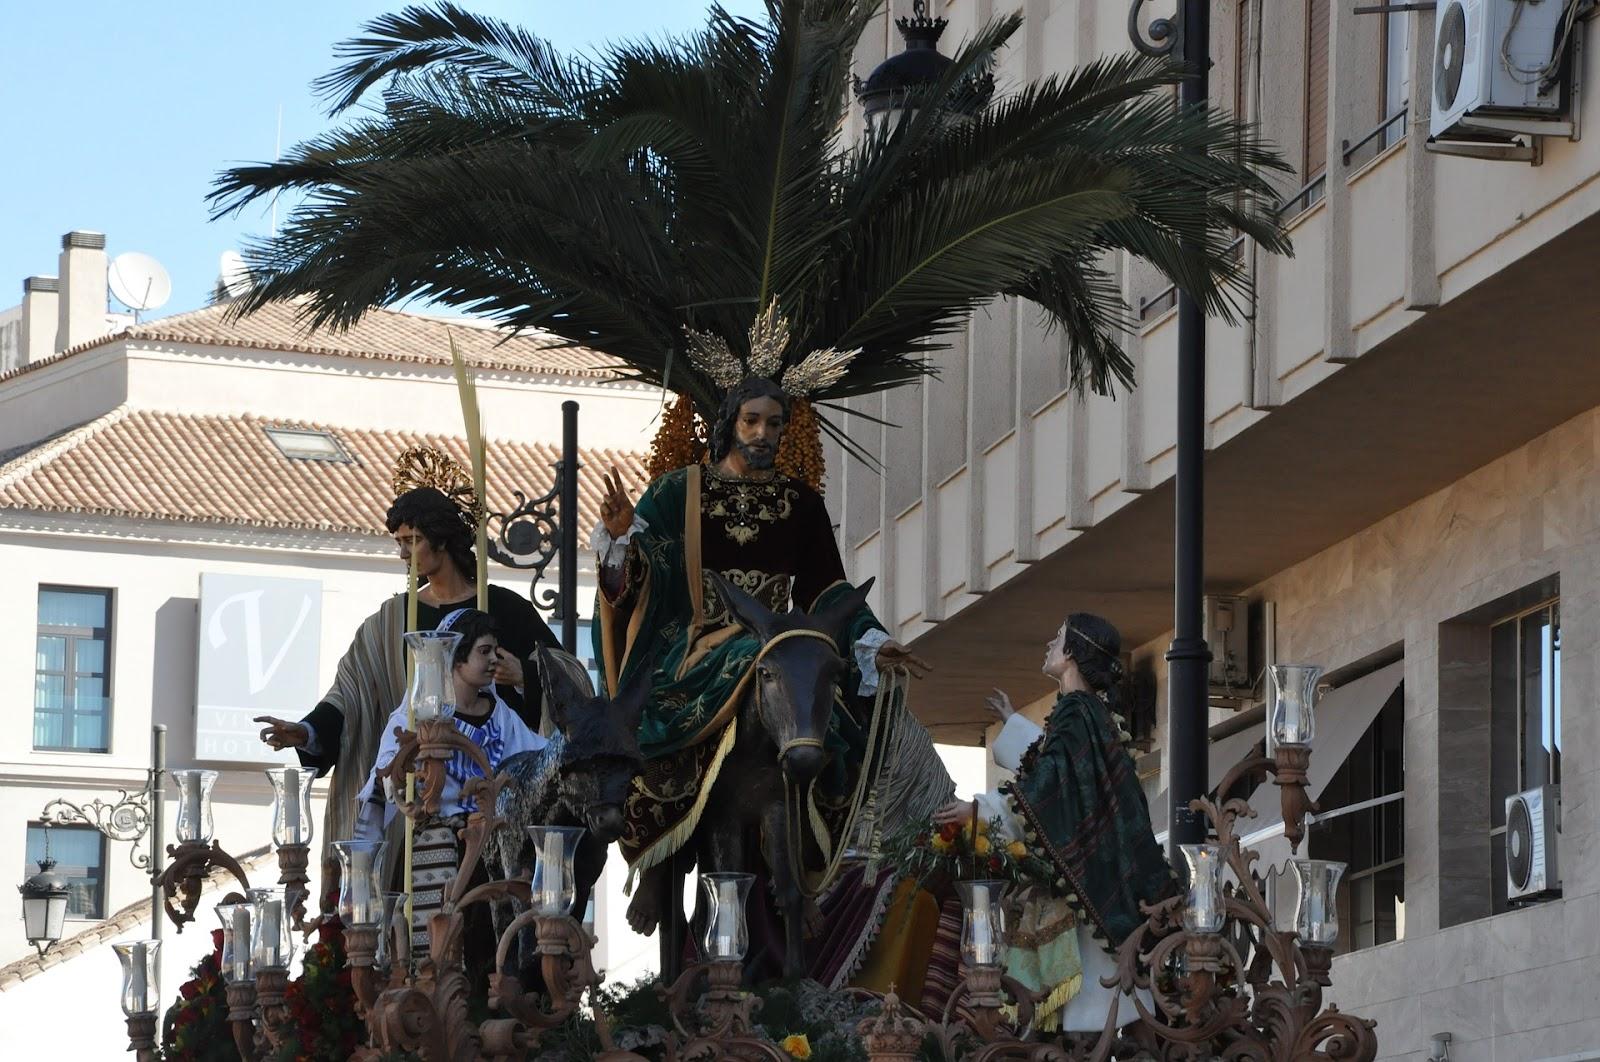 La Pollinica Semana Santa Málaga